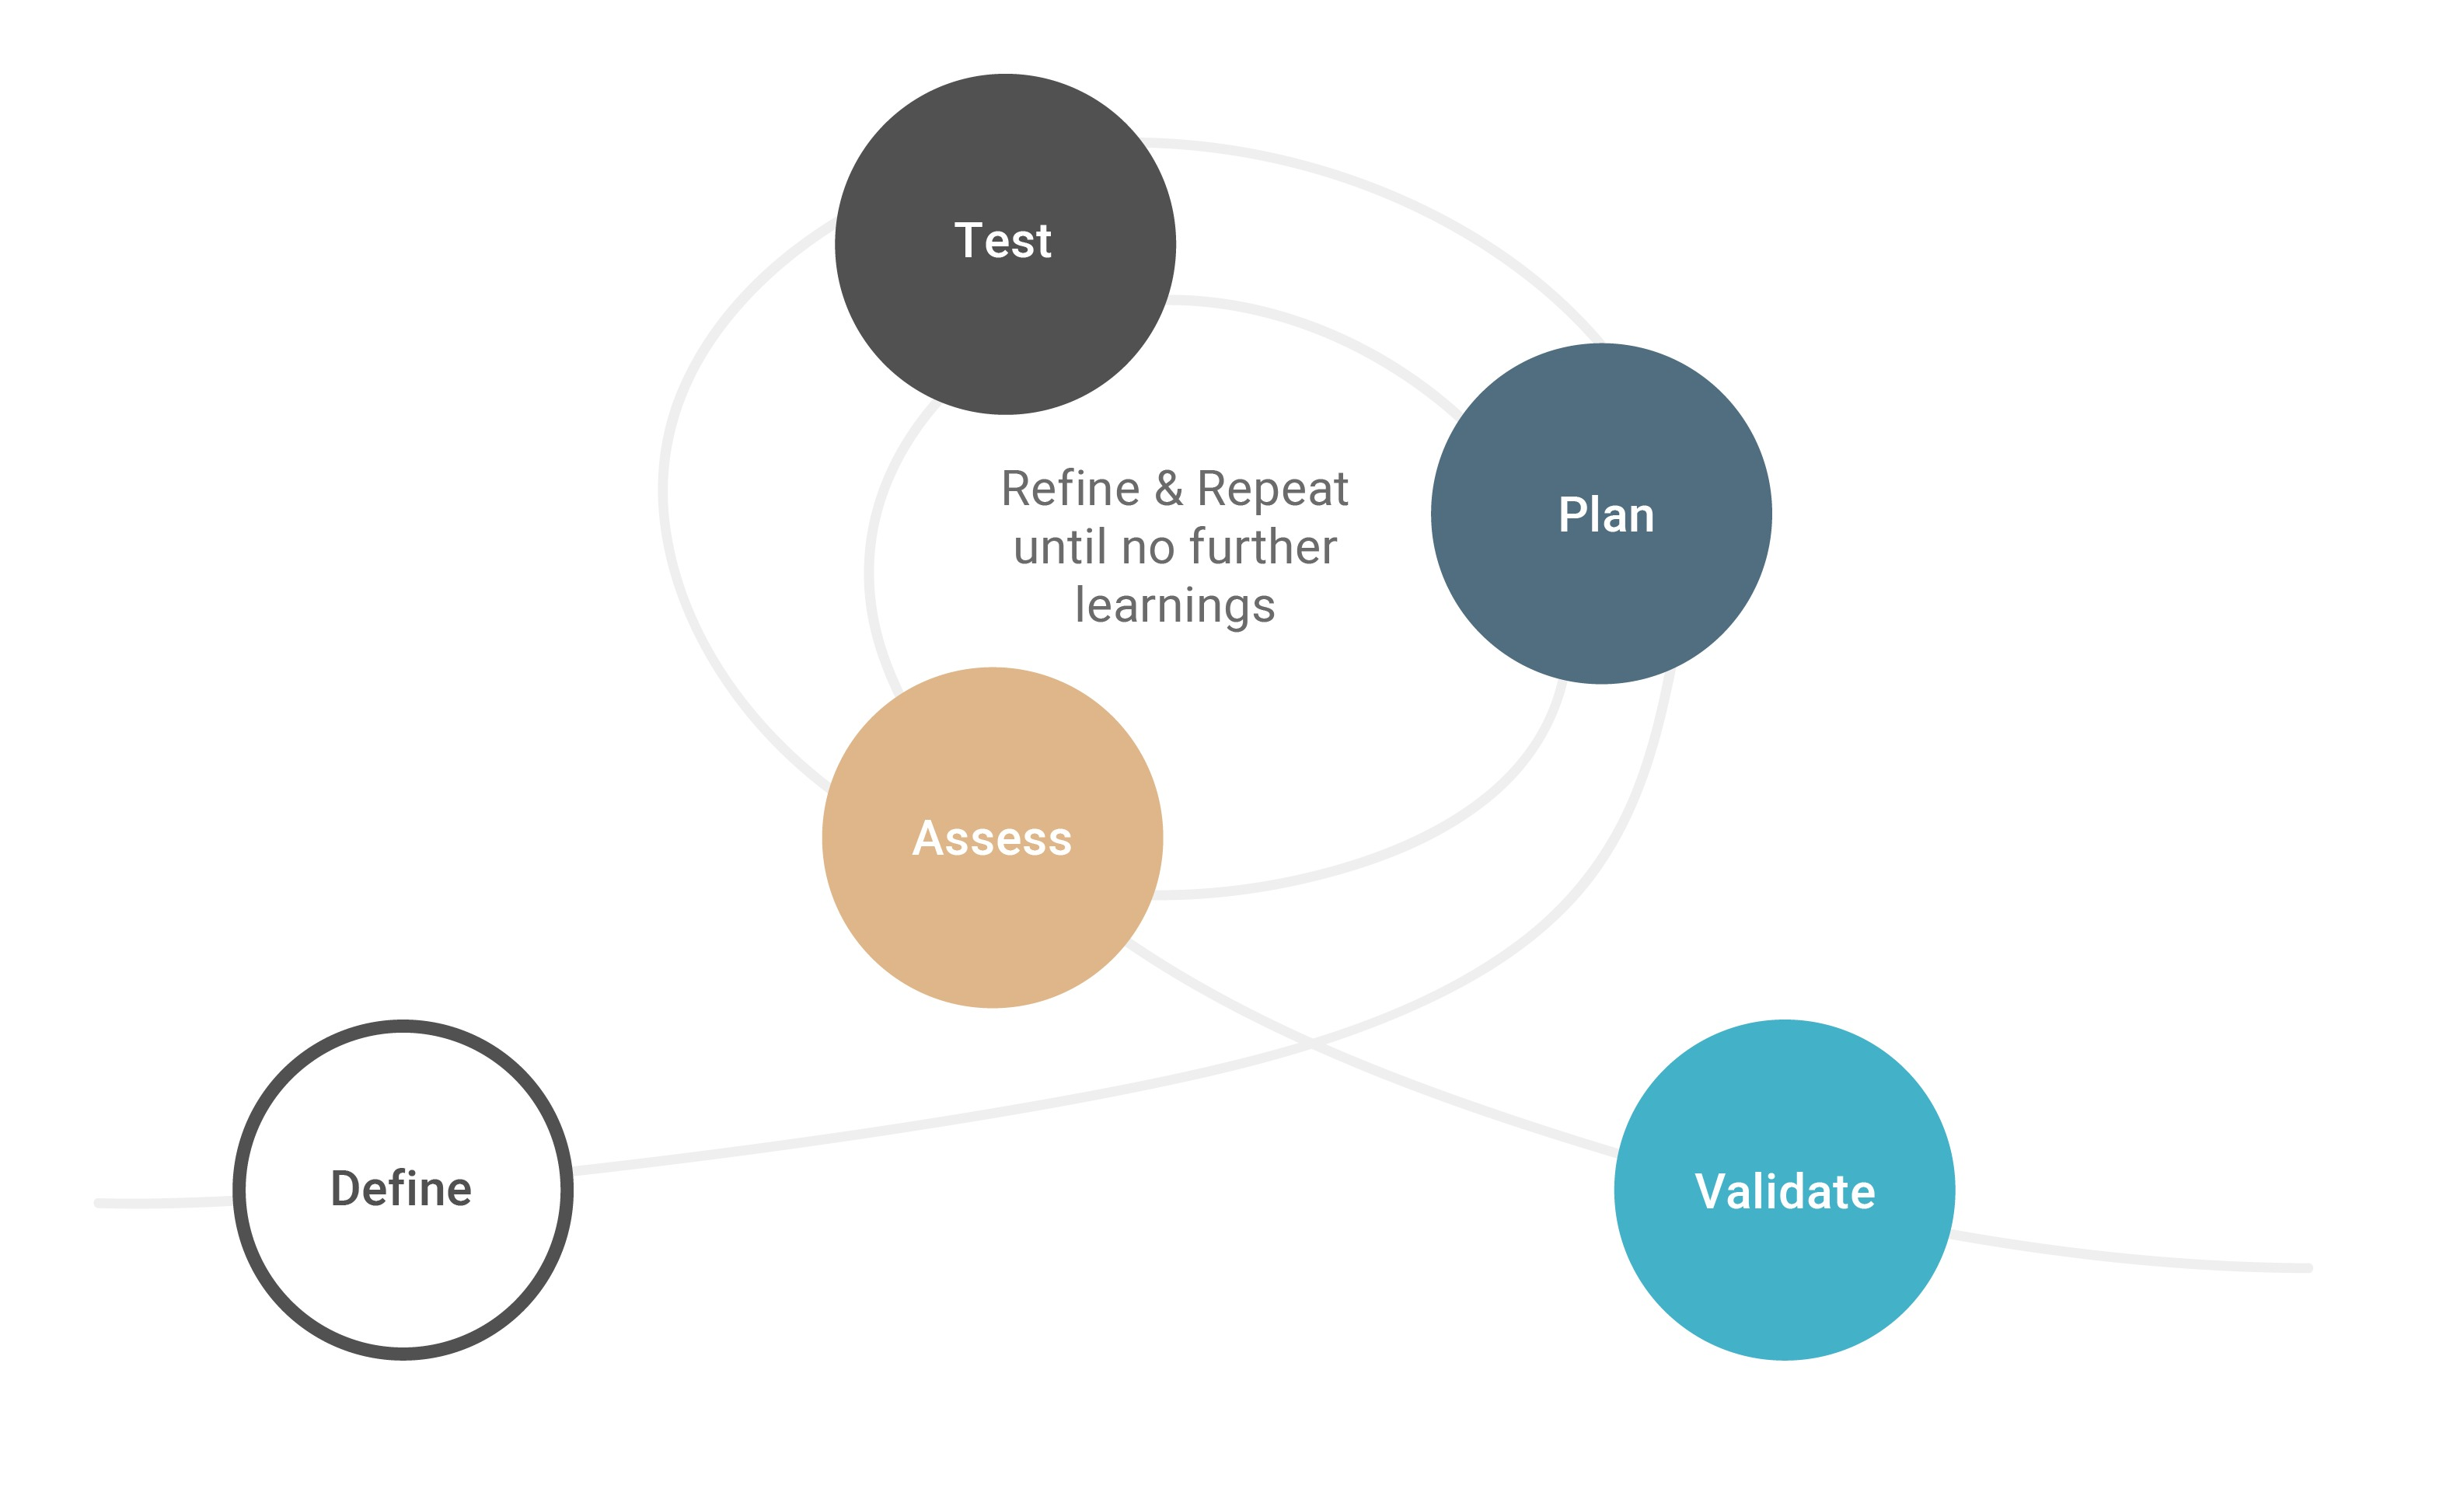 Diagram showing the test process flow